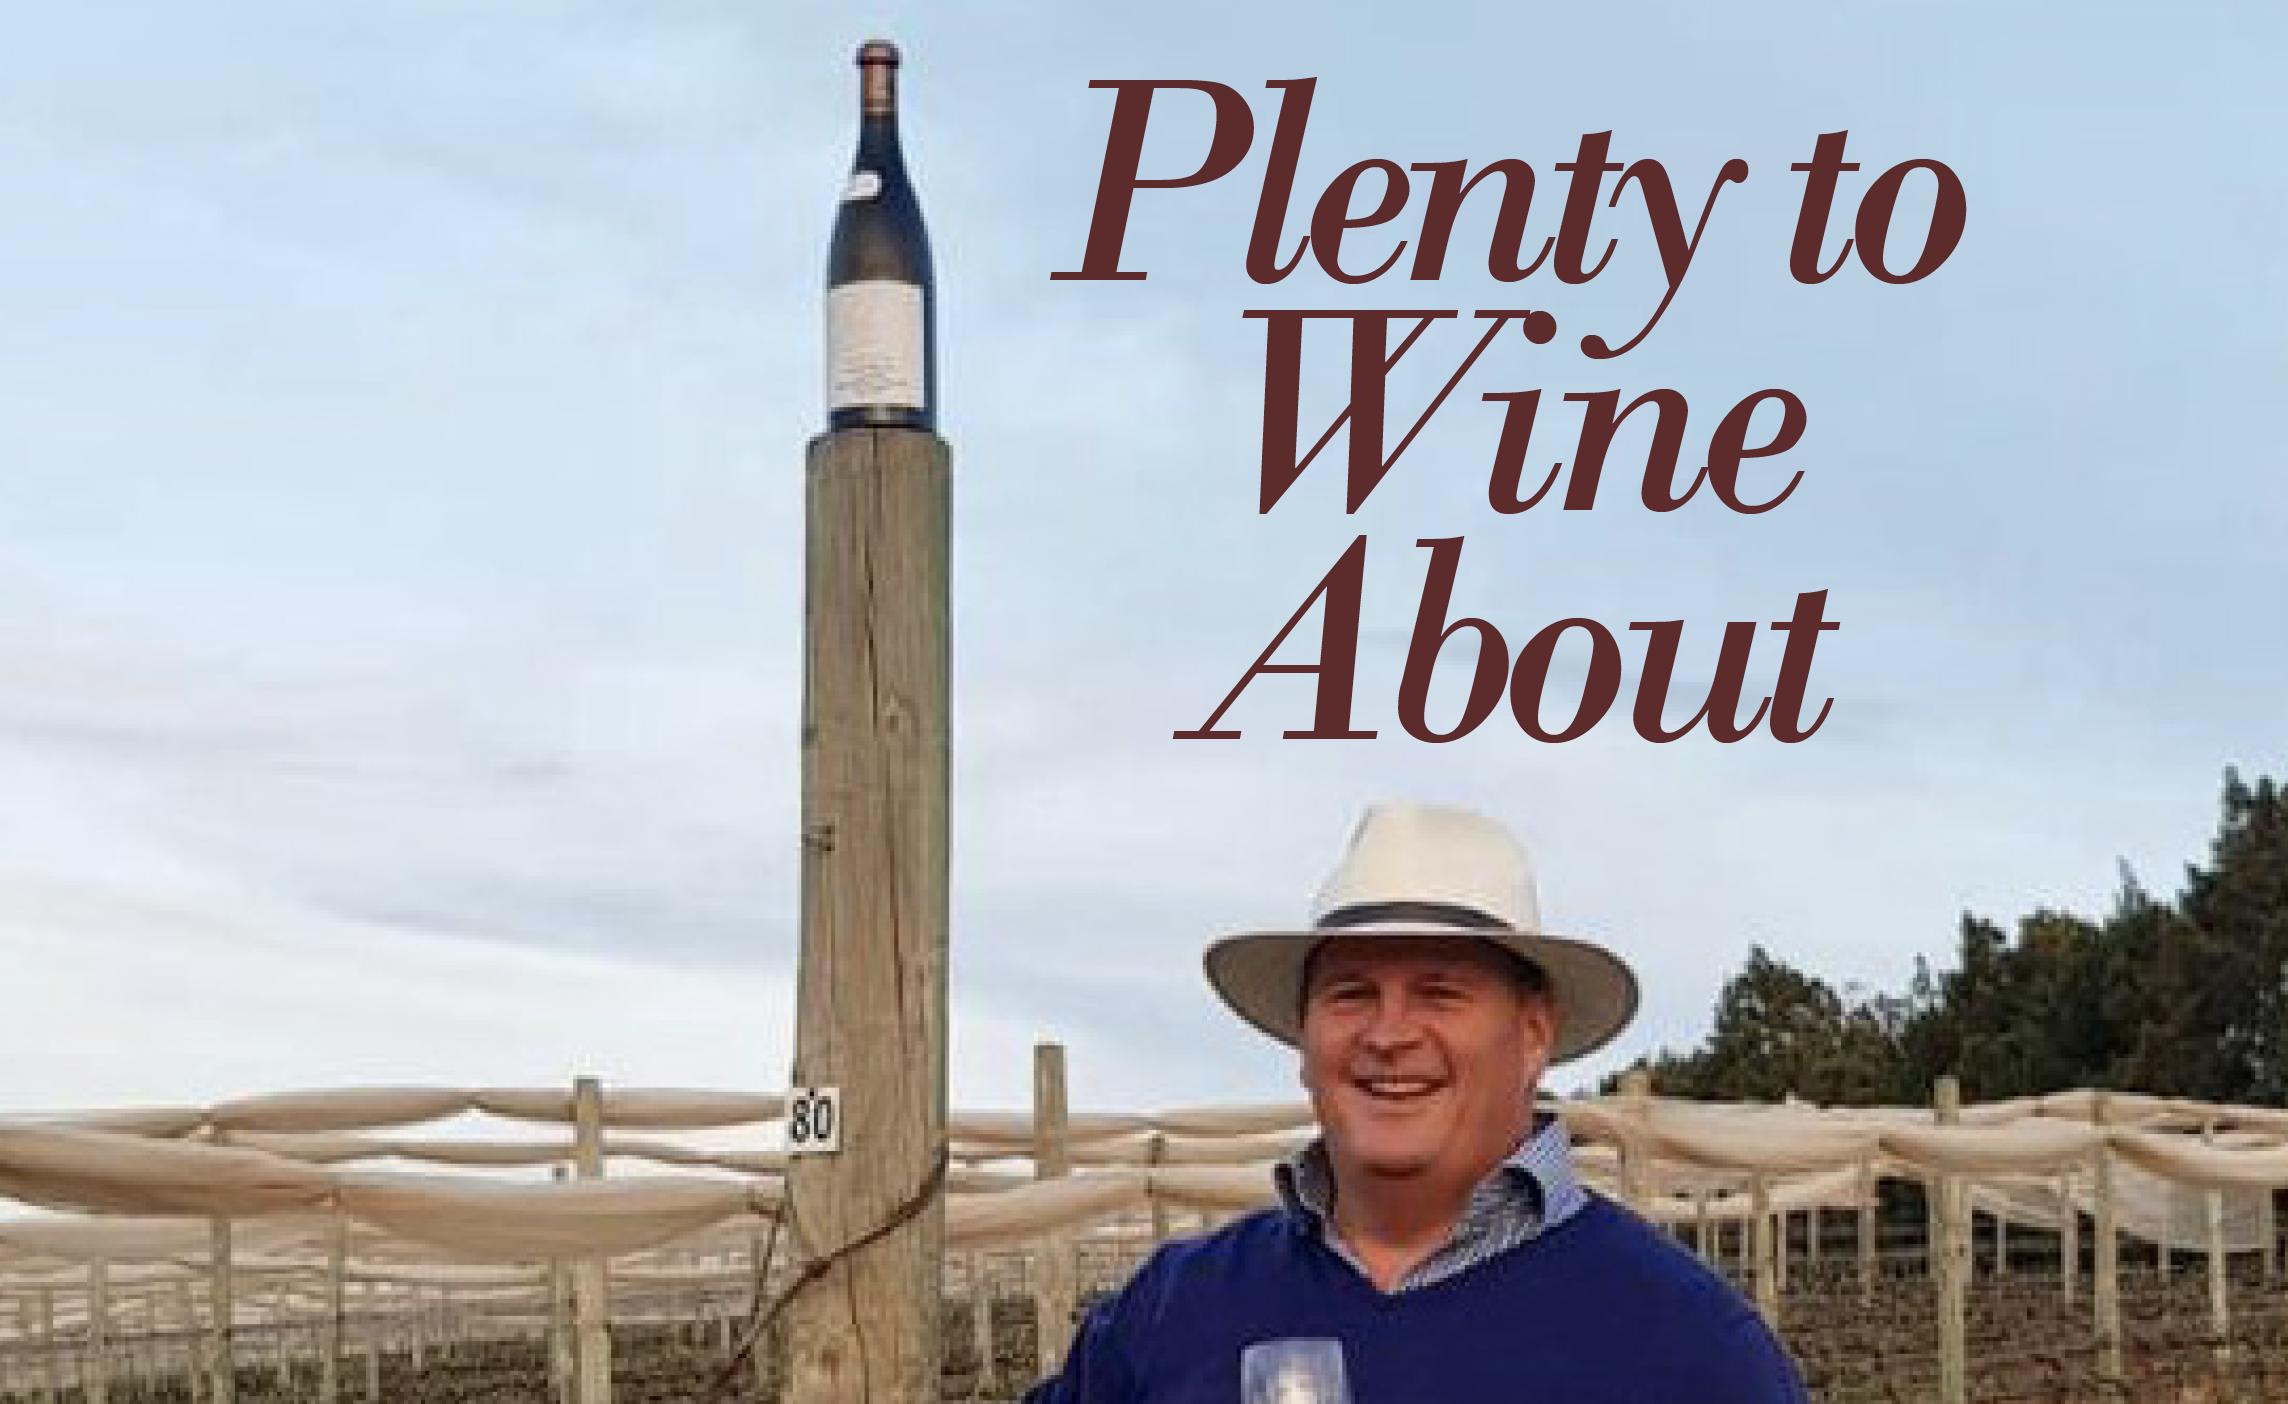 Plenty to Wine About